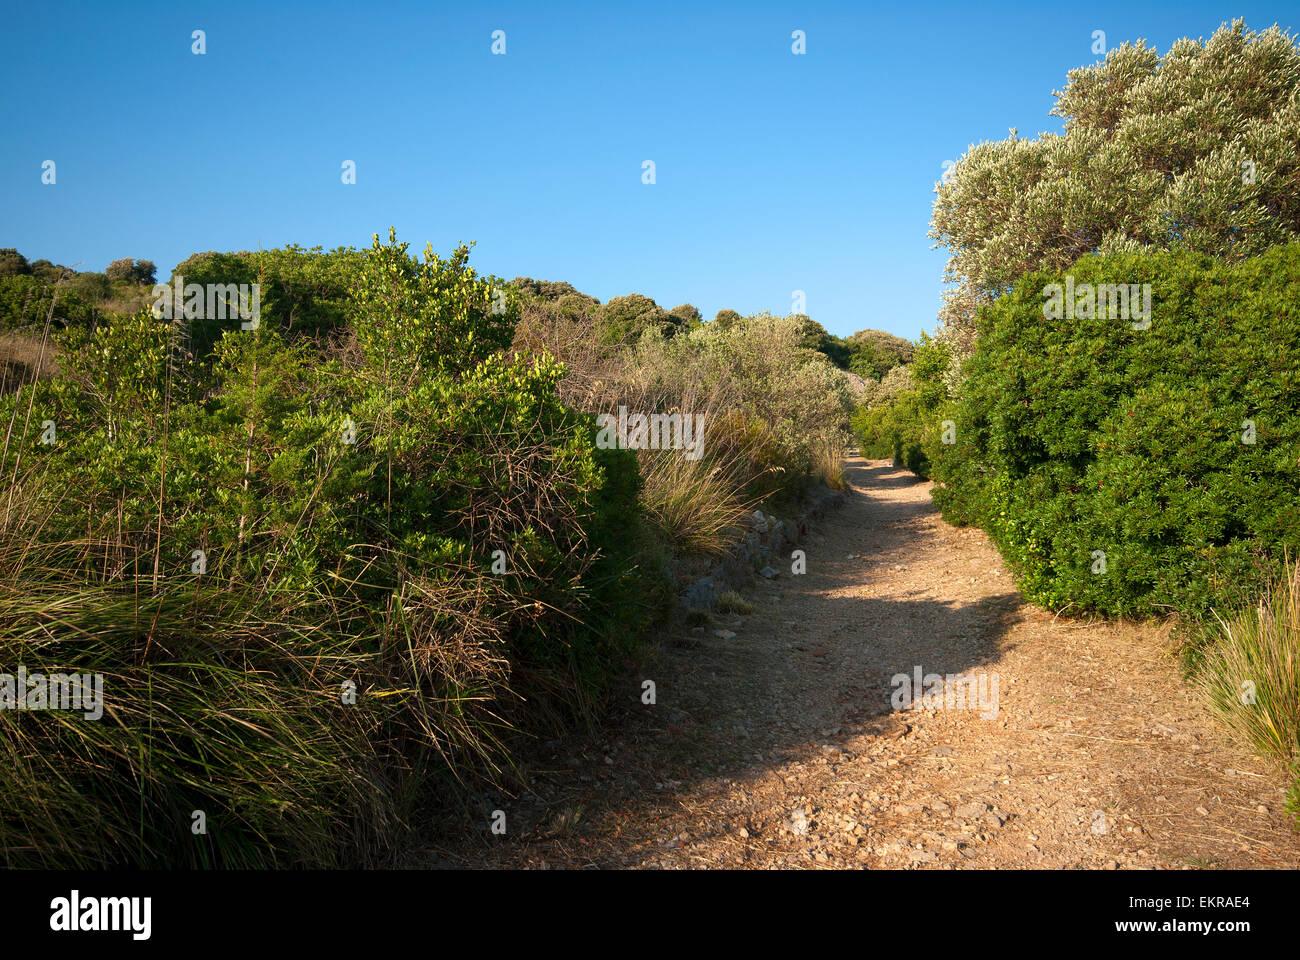 Hiking trail in Mount Orlando Regional Park, Gaeta, Lazio, Italy - Stock Image